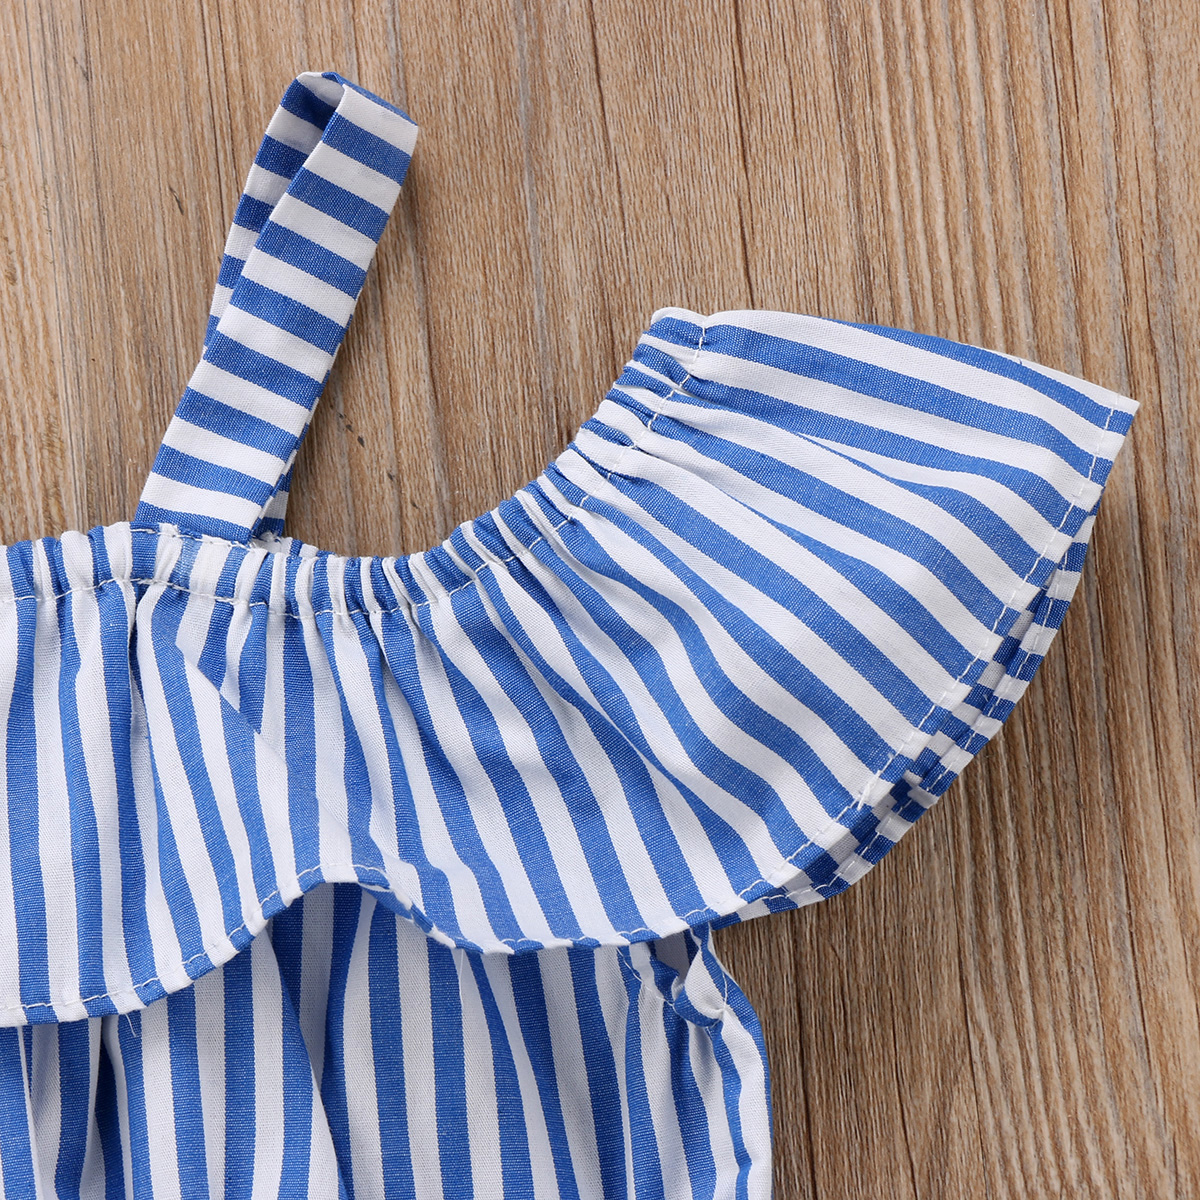 2pcs Kids Baby Girls Outfits Casual T-shirt Tops Long Pants Leggings Set Summer